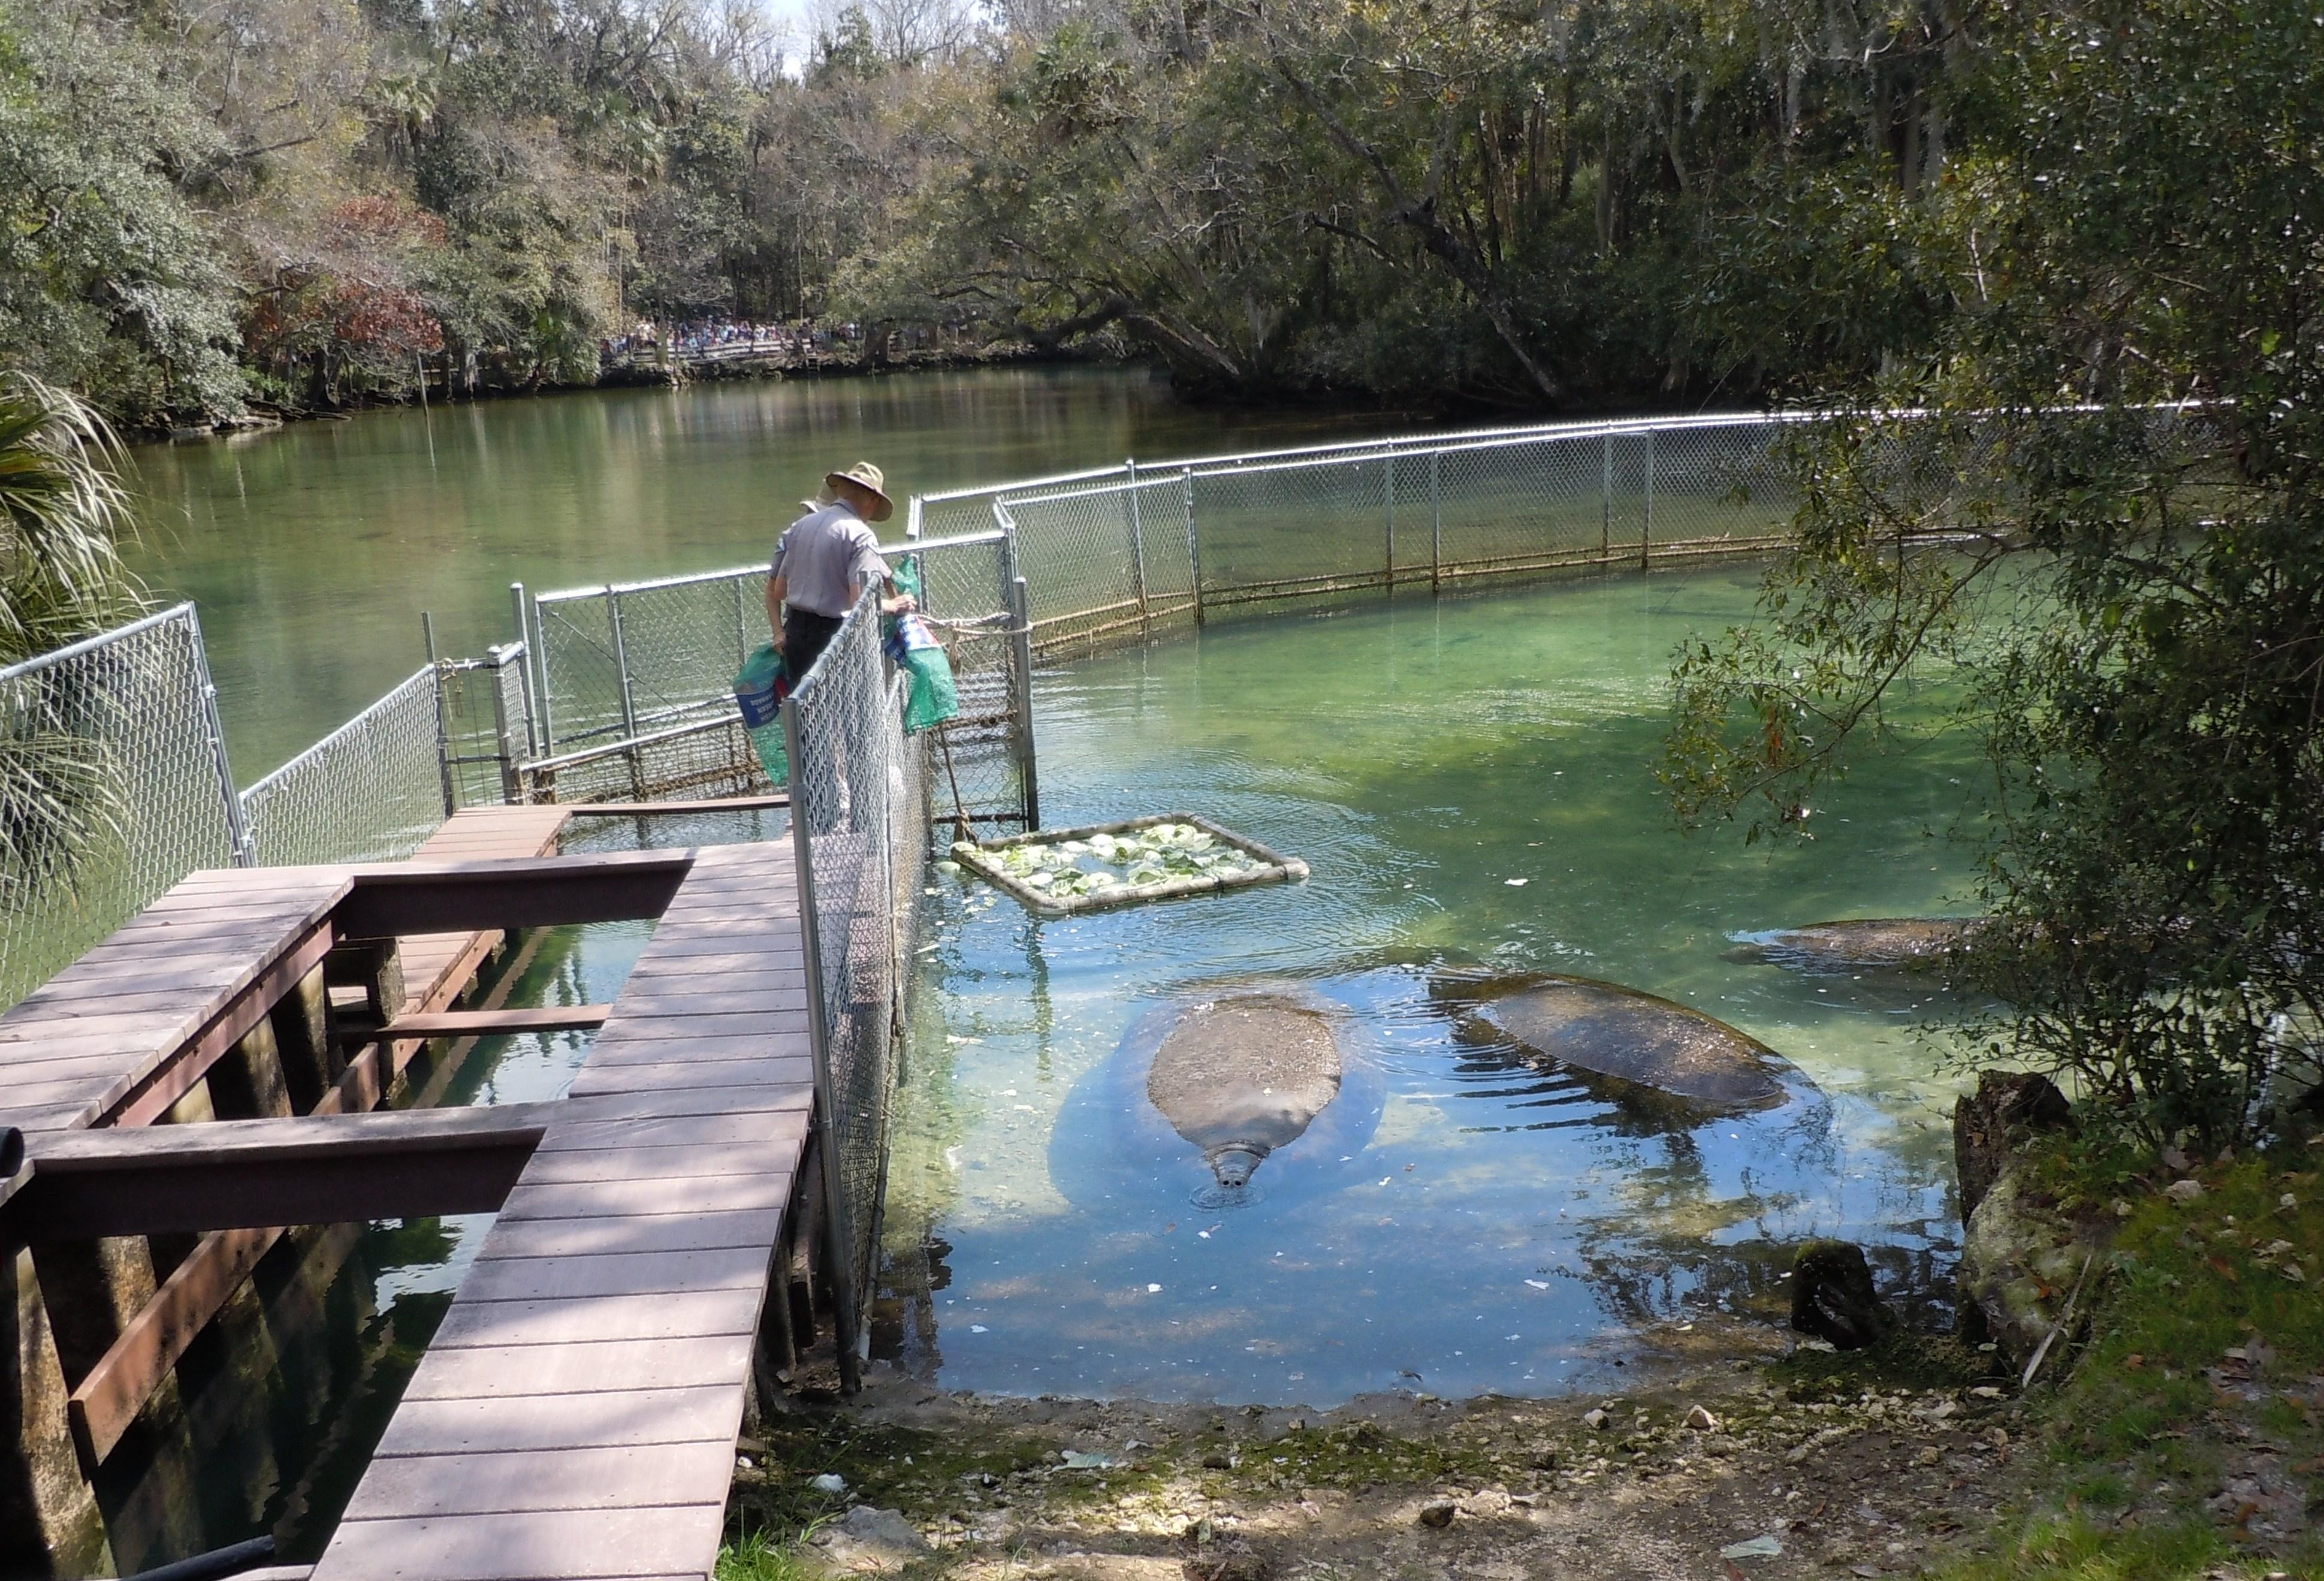 Homosassa Manatees Getting Fed Cabbage Animaltourism News